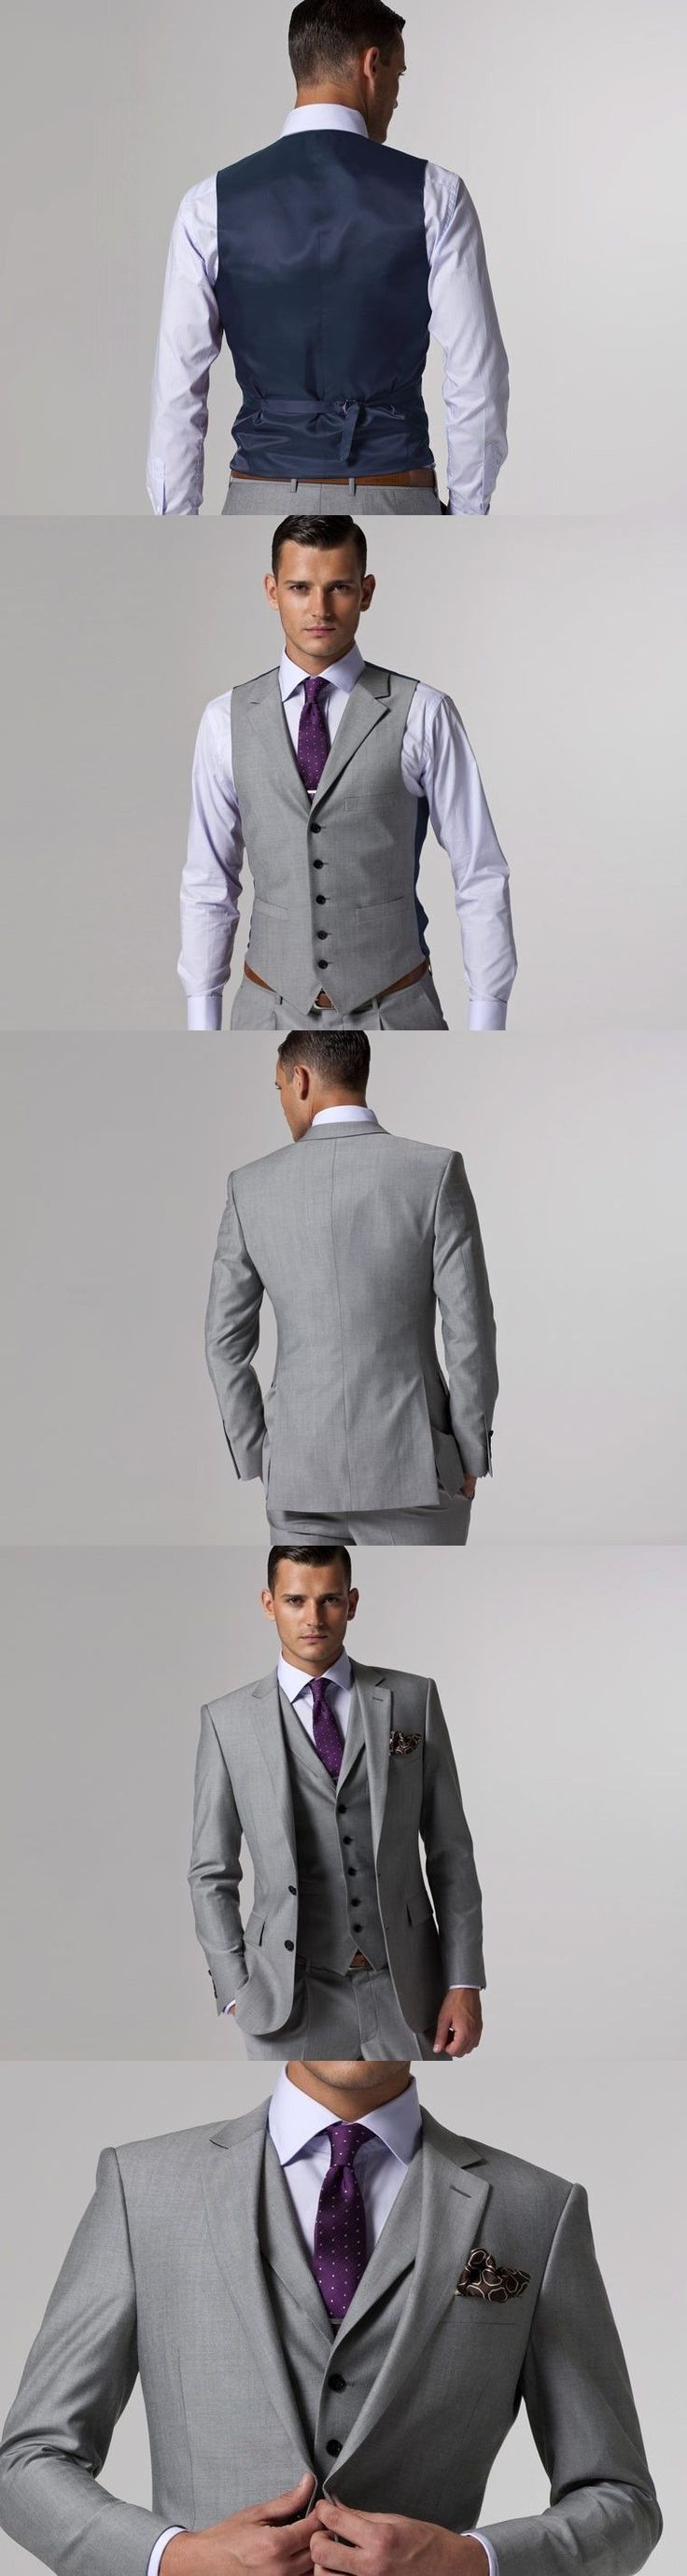 Gray Wedding Tuxedo Custom Made Grey Suits Gray Groom Suit Mens Gray Tuxedo Jacket,2017 Grey Wedding Tuxedos,3 Piece Grey Suit #menweddingsuits #menssuitsgrey